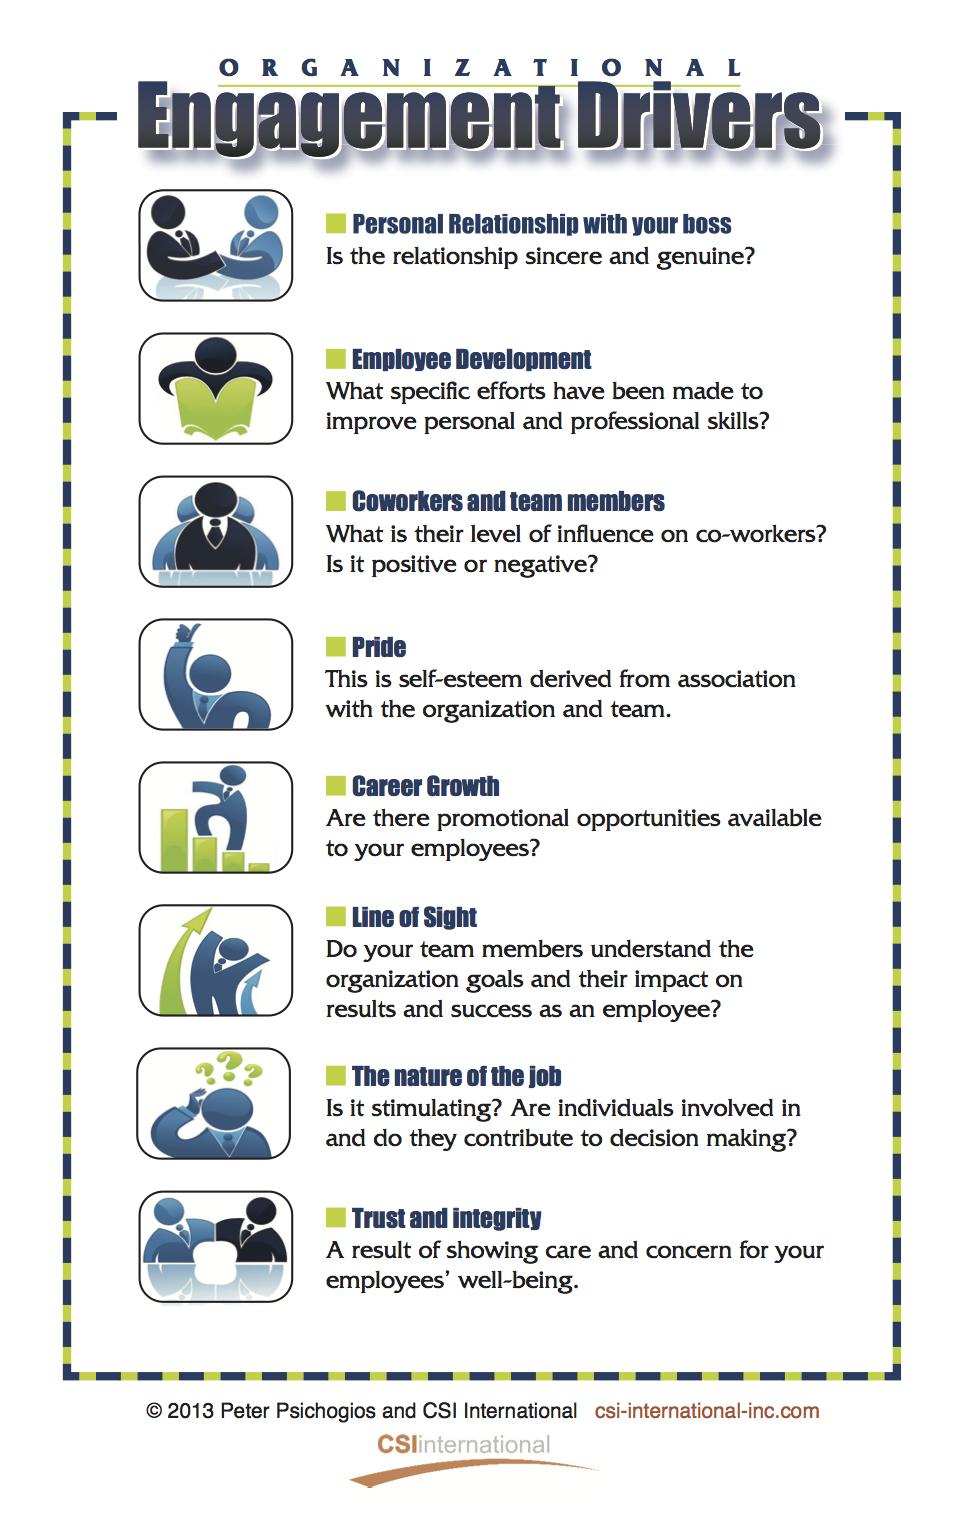 7 Key Organizational Engagement Drivers Employee Engagement Employee Engagement Initiatives Employee Development